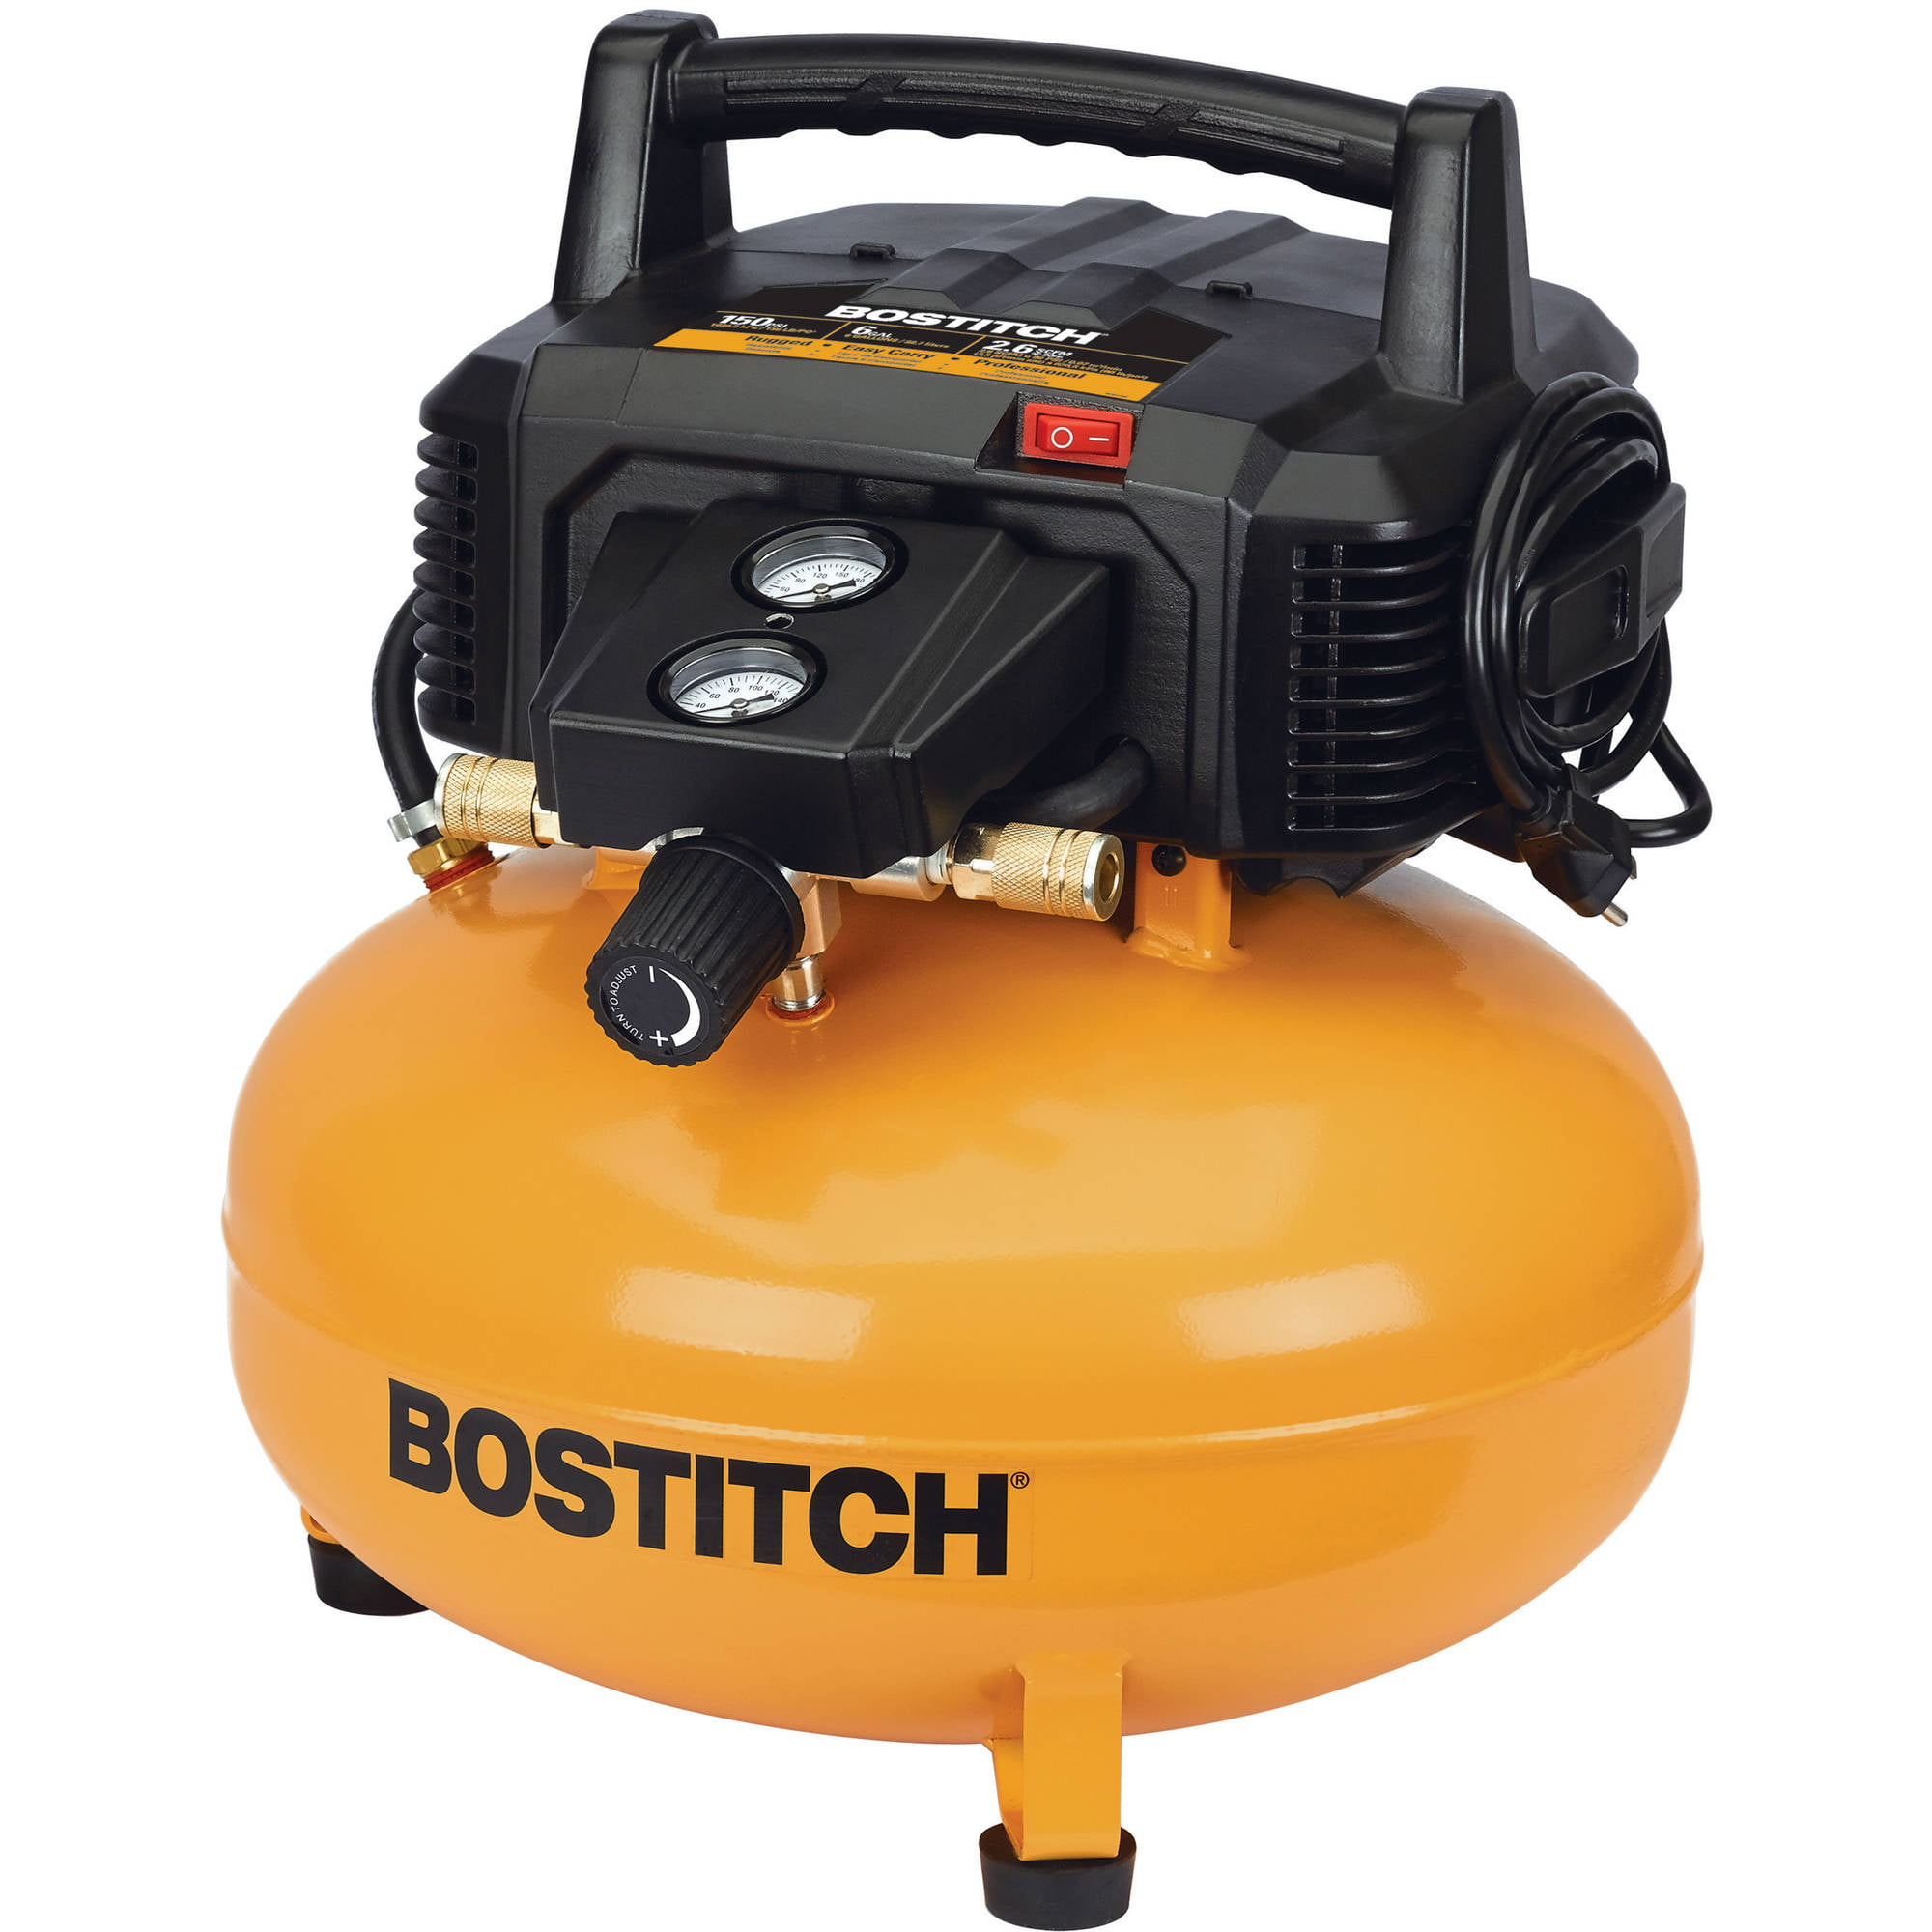 bostitch btfp02012 6 gallon pancake compressor walmart com rh walmart com